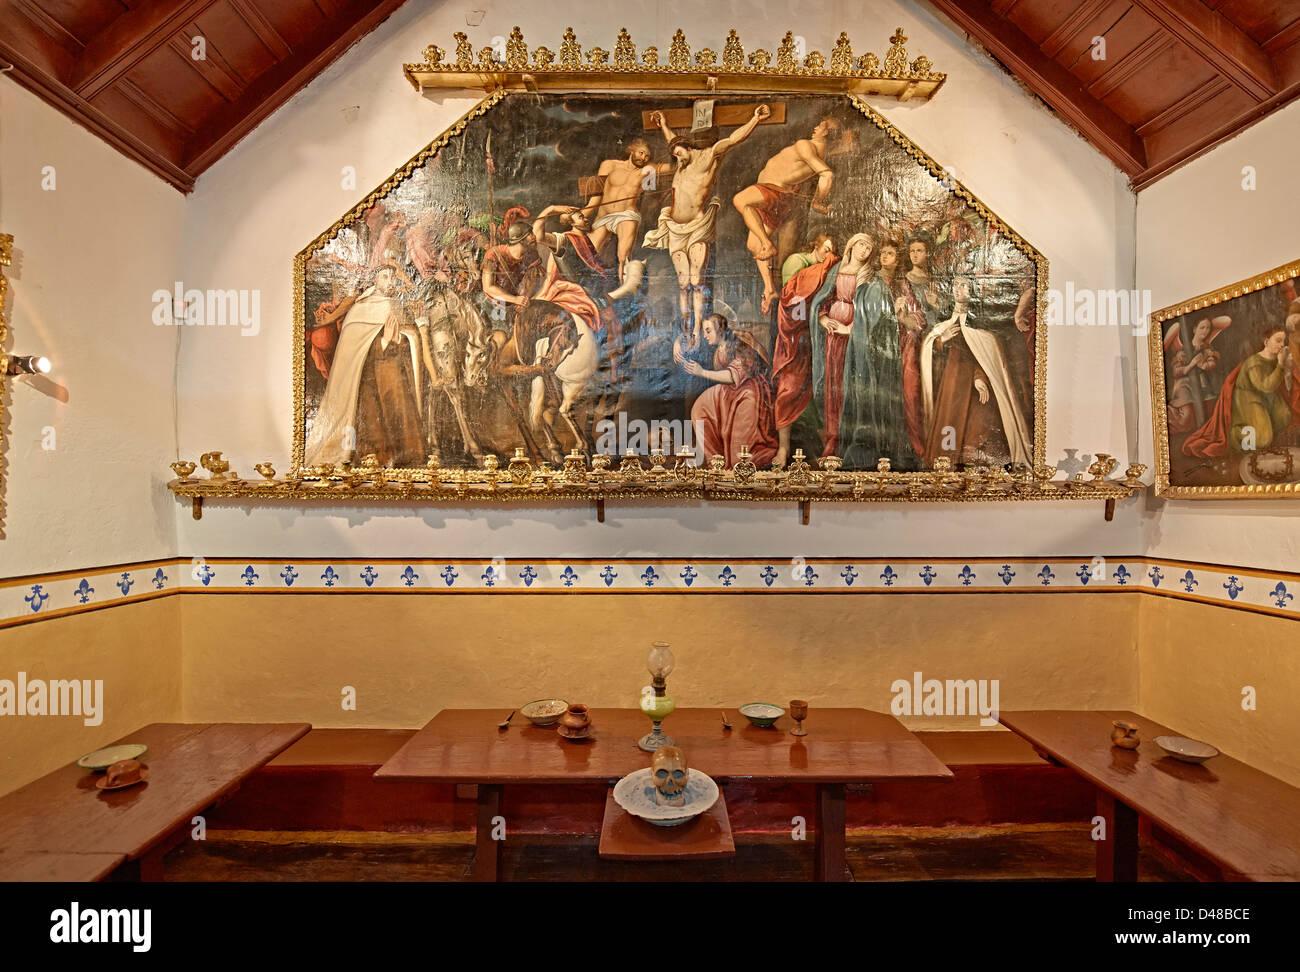 dining room in convent, Convento de Santa Teresa, Potosi, Bolivia, South America - Stock Image